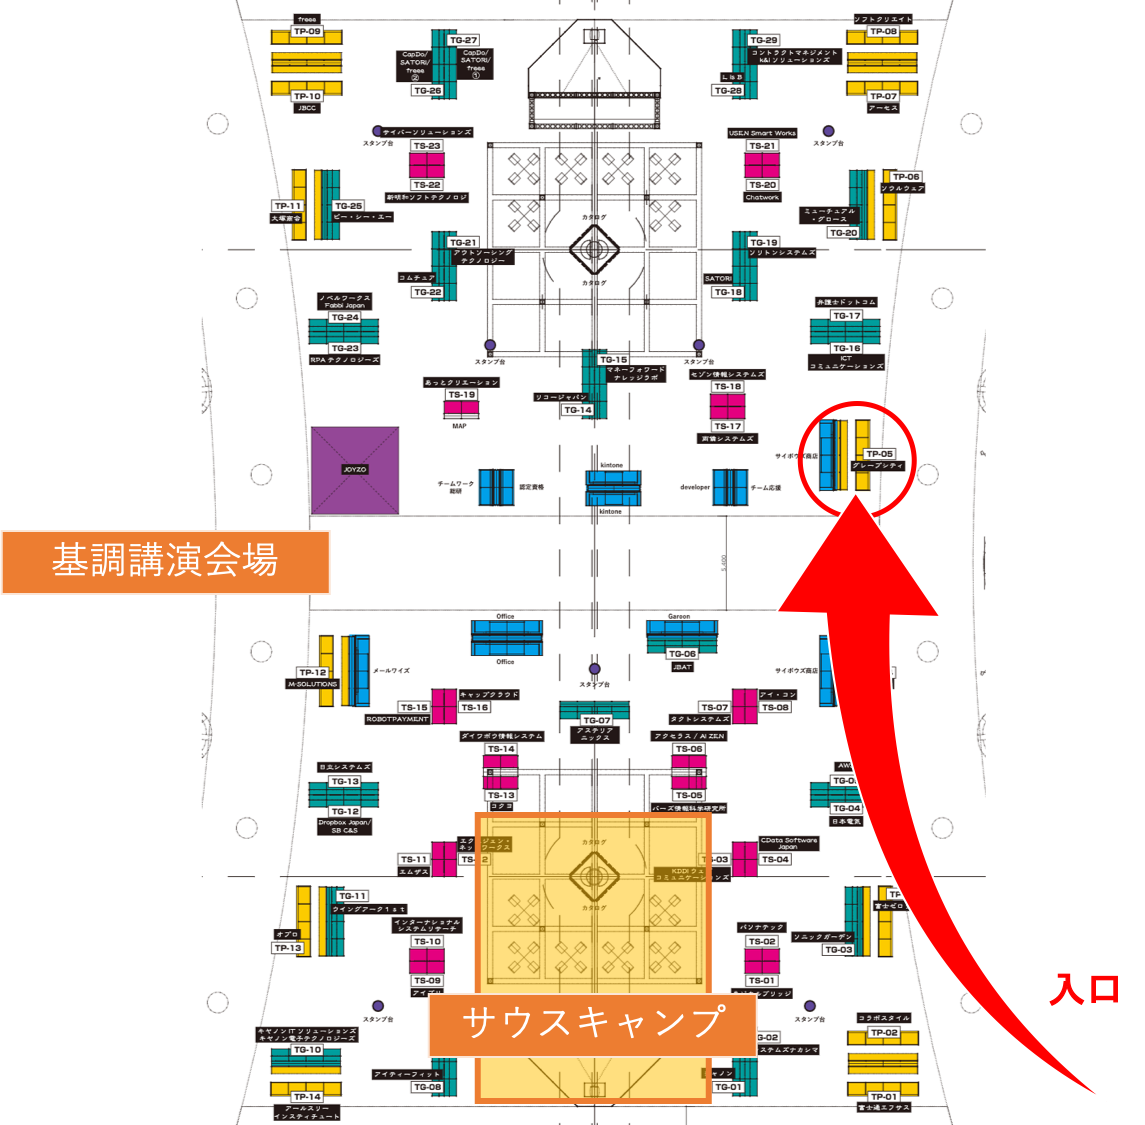 Cybozu Days 2019 東京「krew」出展場所